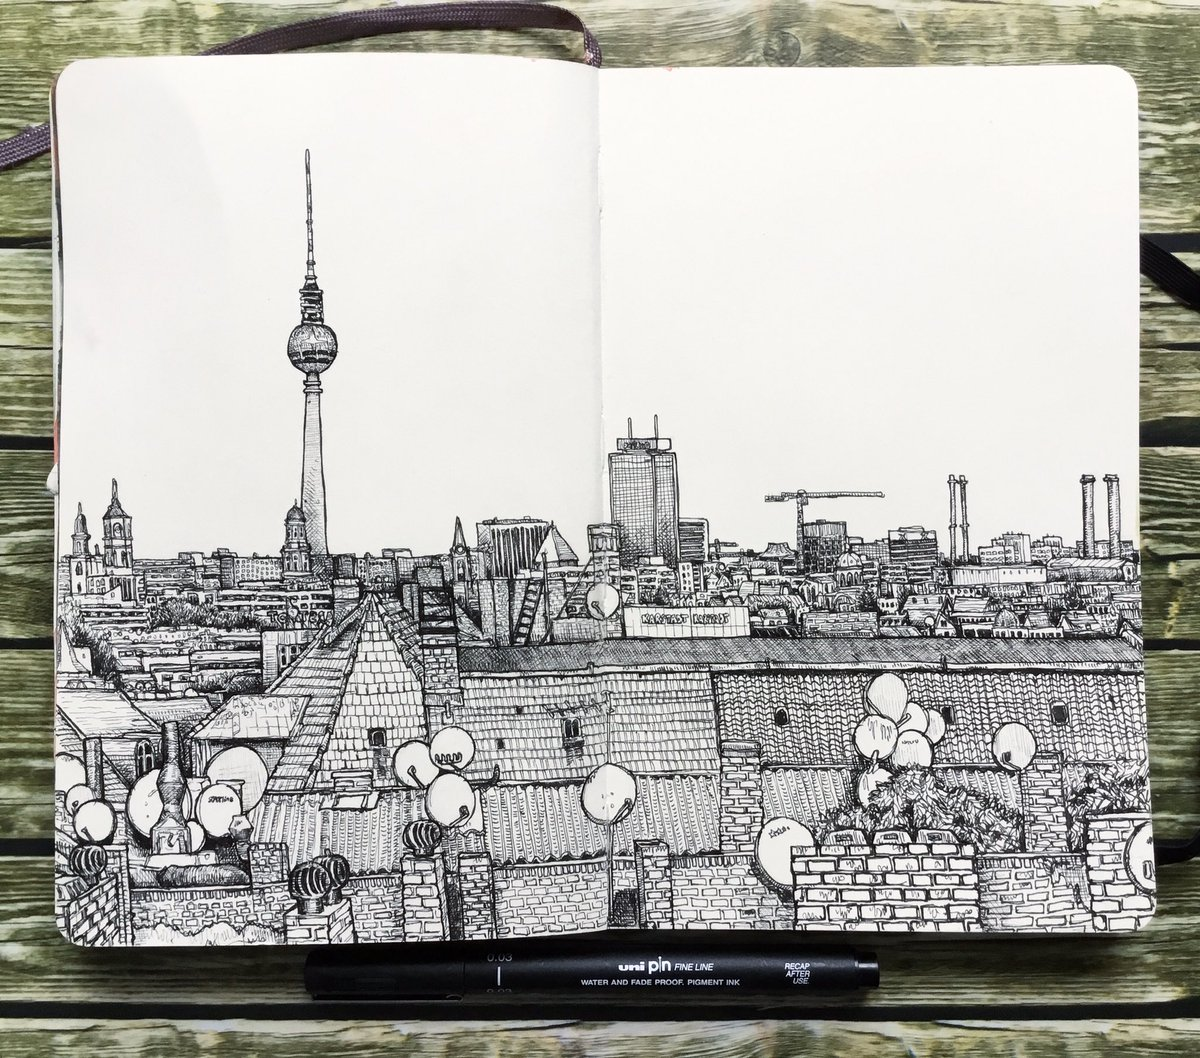 #Berlin #Kreuzberg #drawing in my #moleskine #sketchbookpic.twitter.com/pgQfHKQDc3